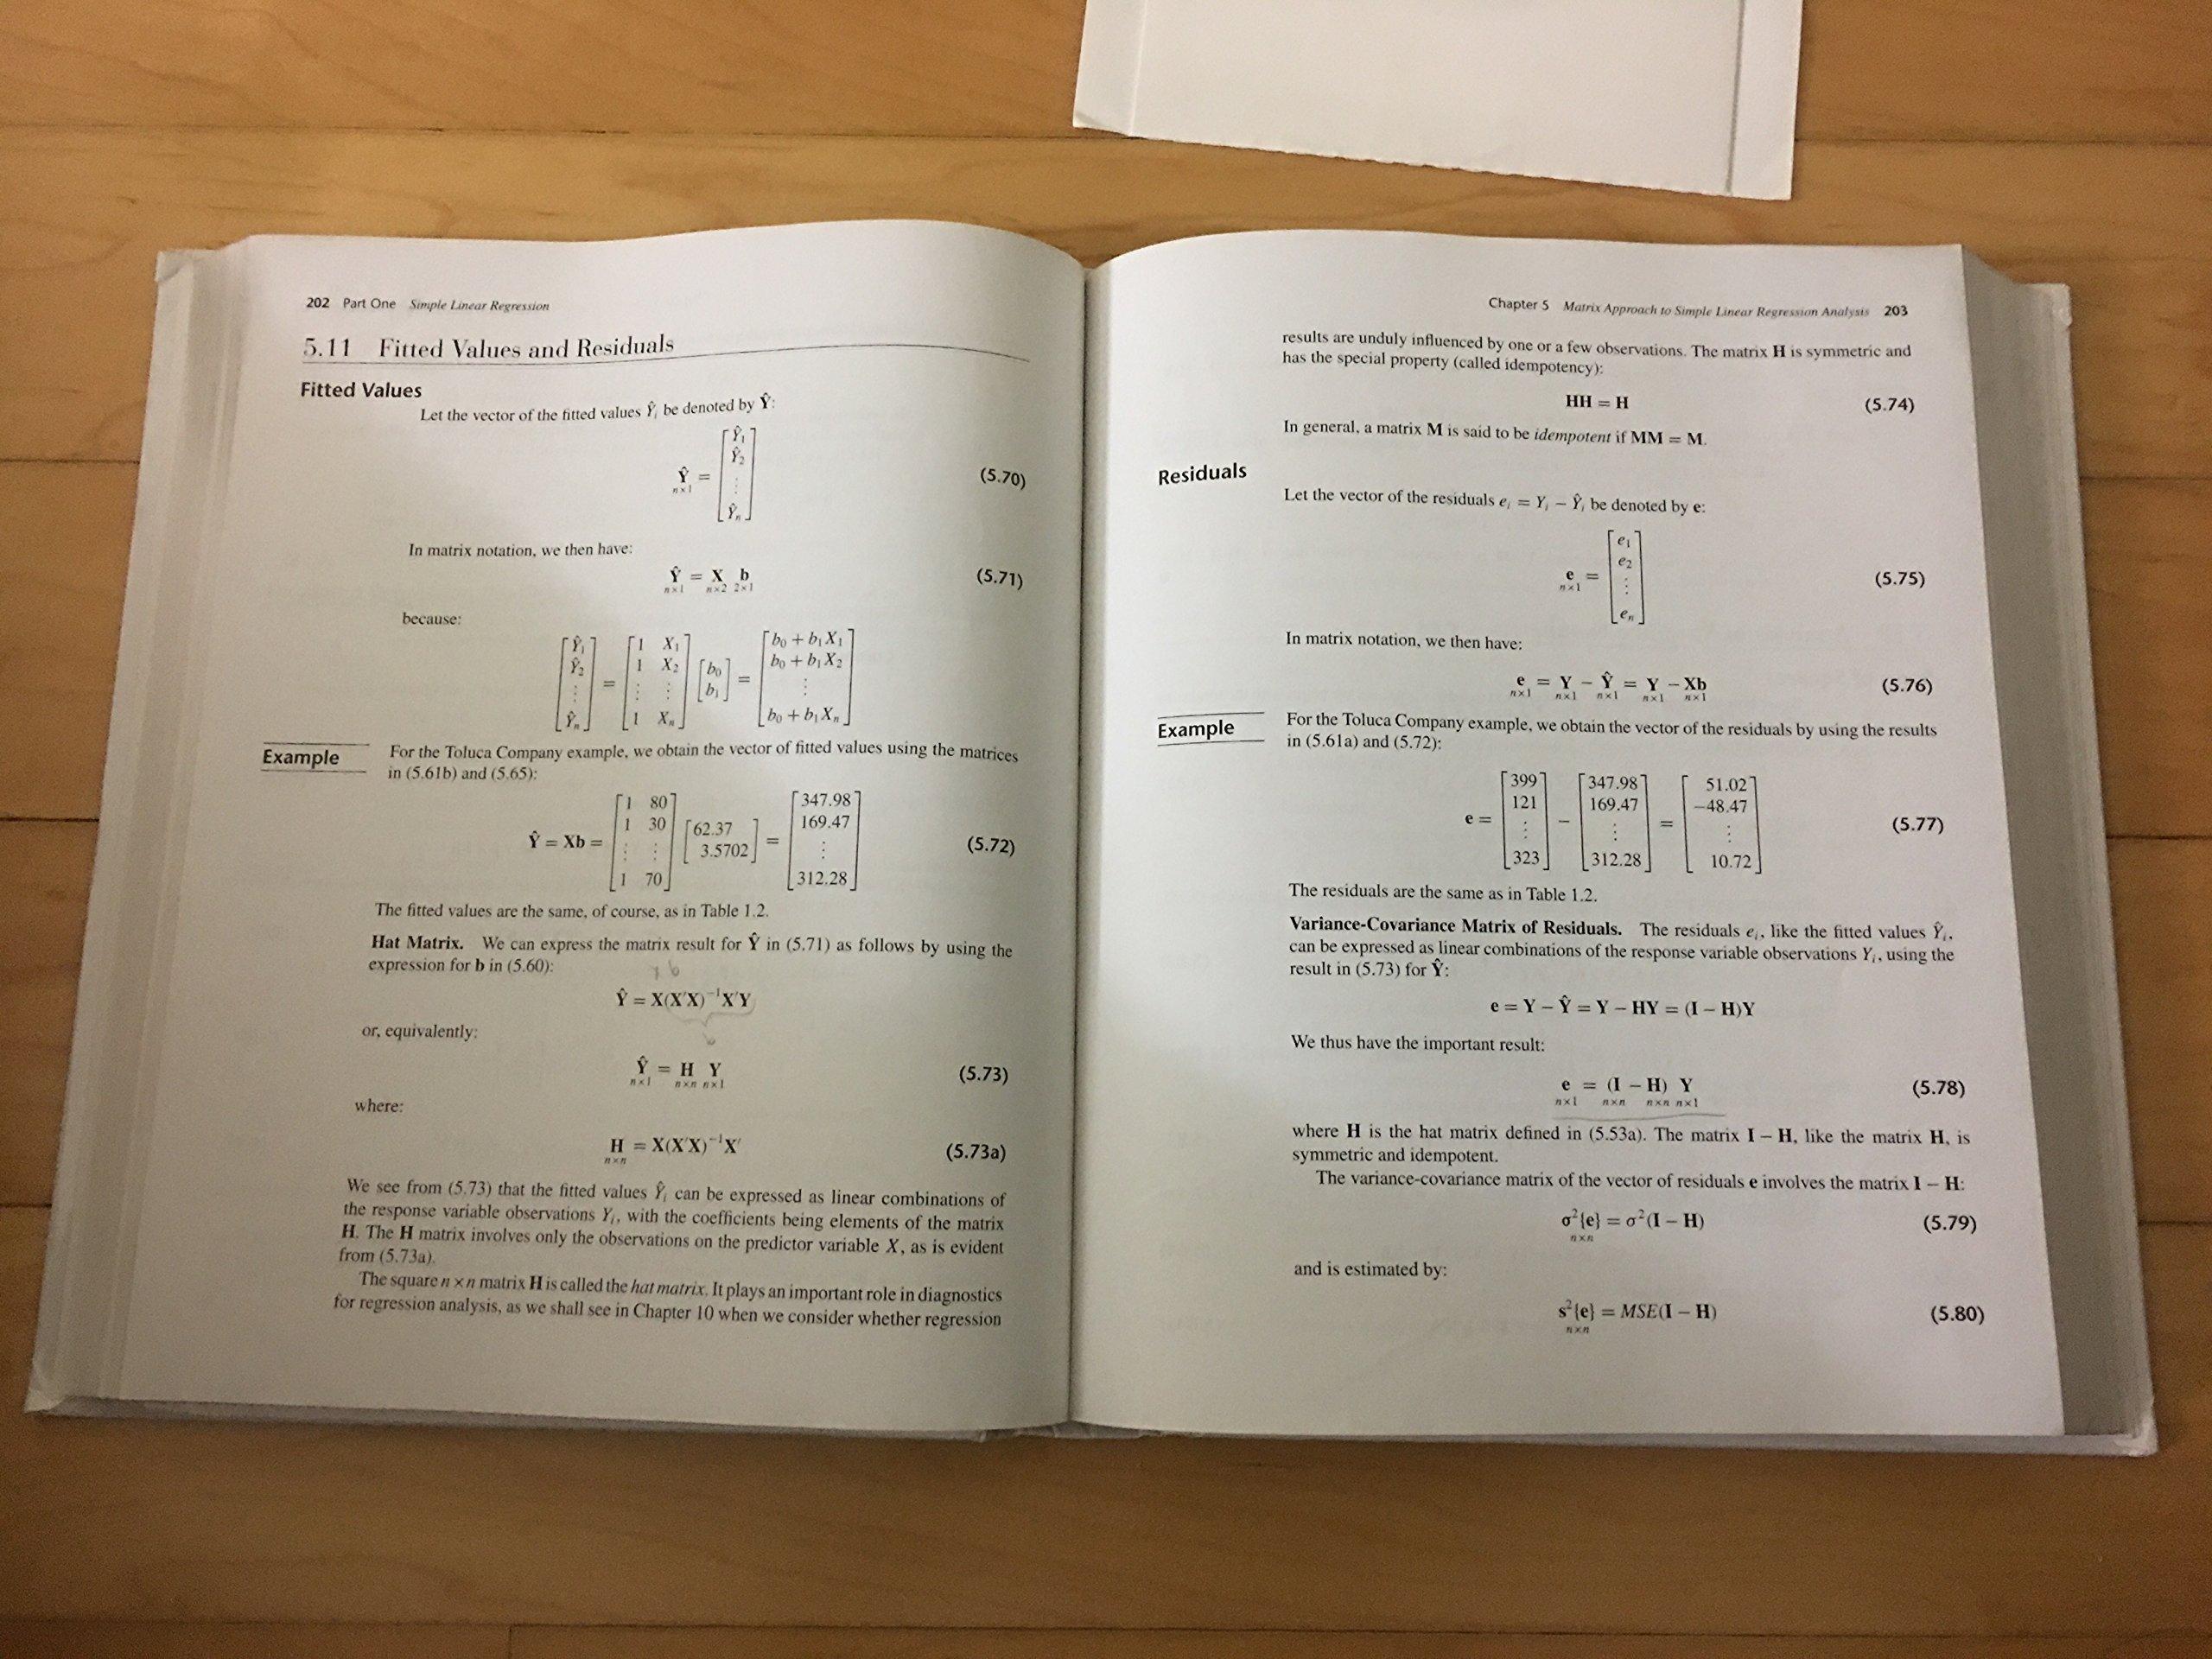 Applied Linear Regression Models: Michael H. Kutner, Christopher J.  Nachtsheim, John Neter: 9780073013442: Books - Amazon.ca